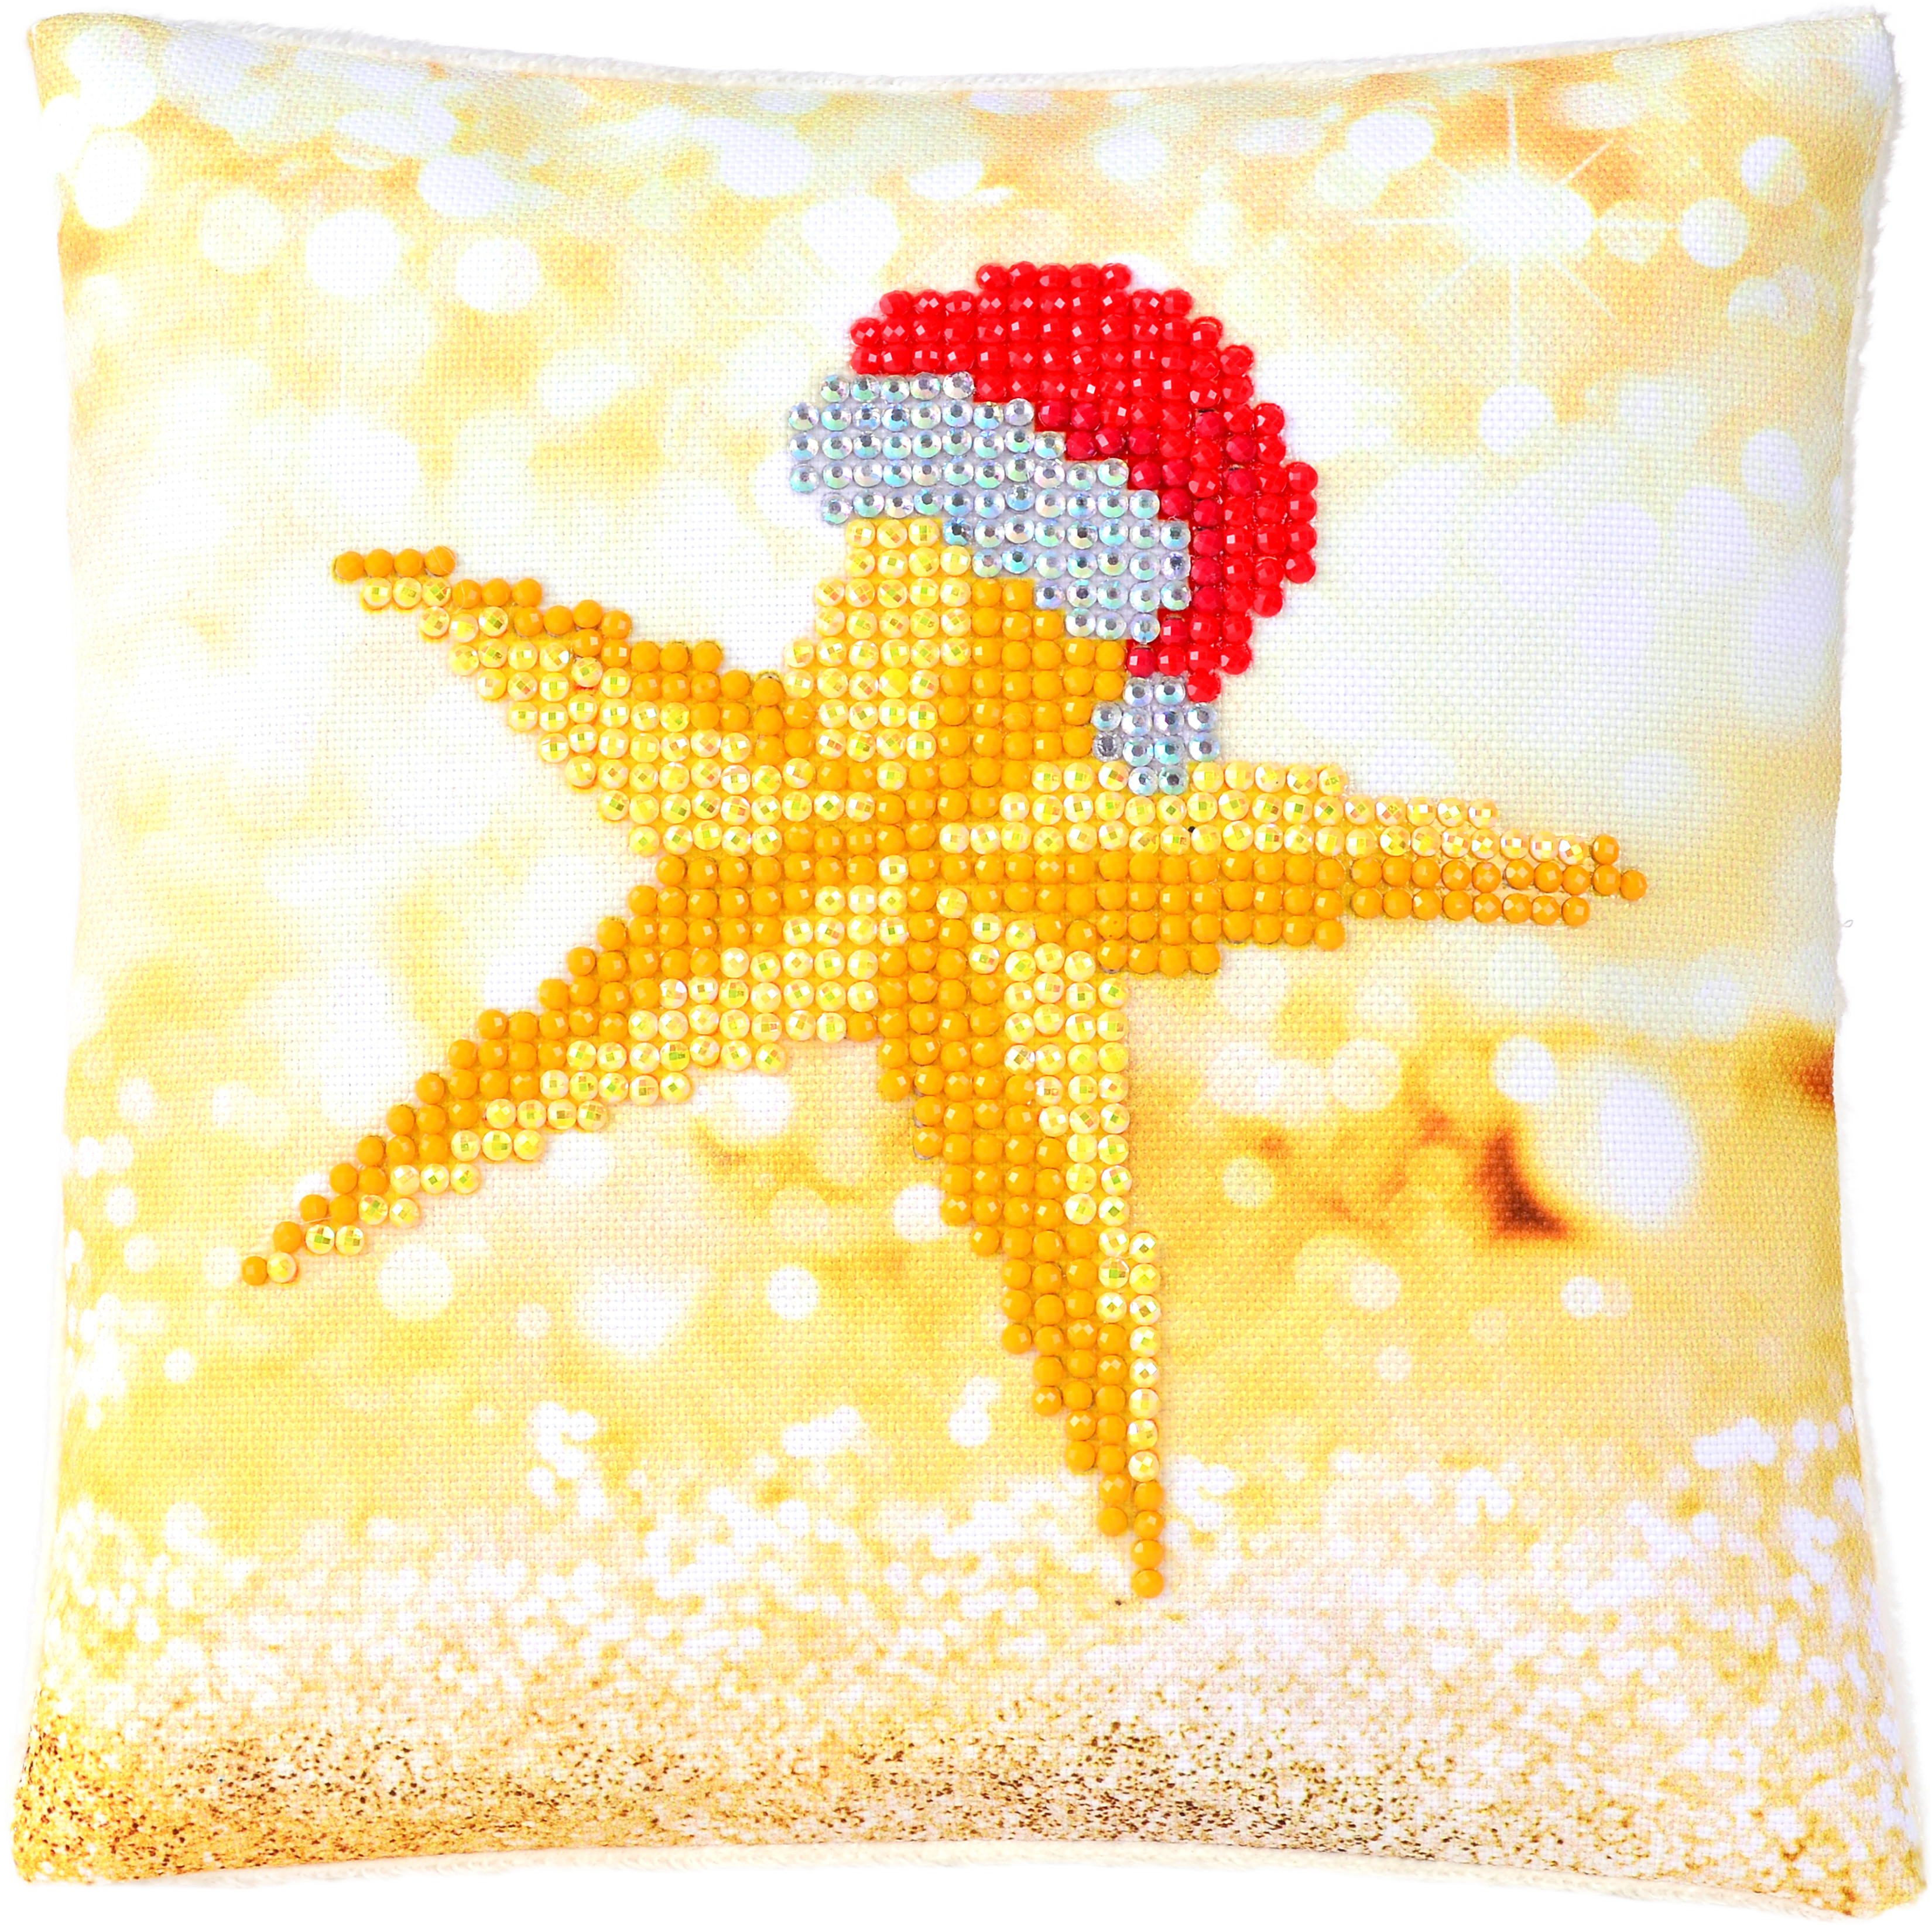 Diamond Dotz Diamond Embroidery Pillow Facet Art Kit 8X8-Christmas Star Pillow